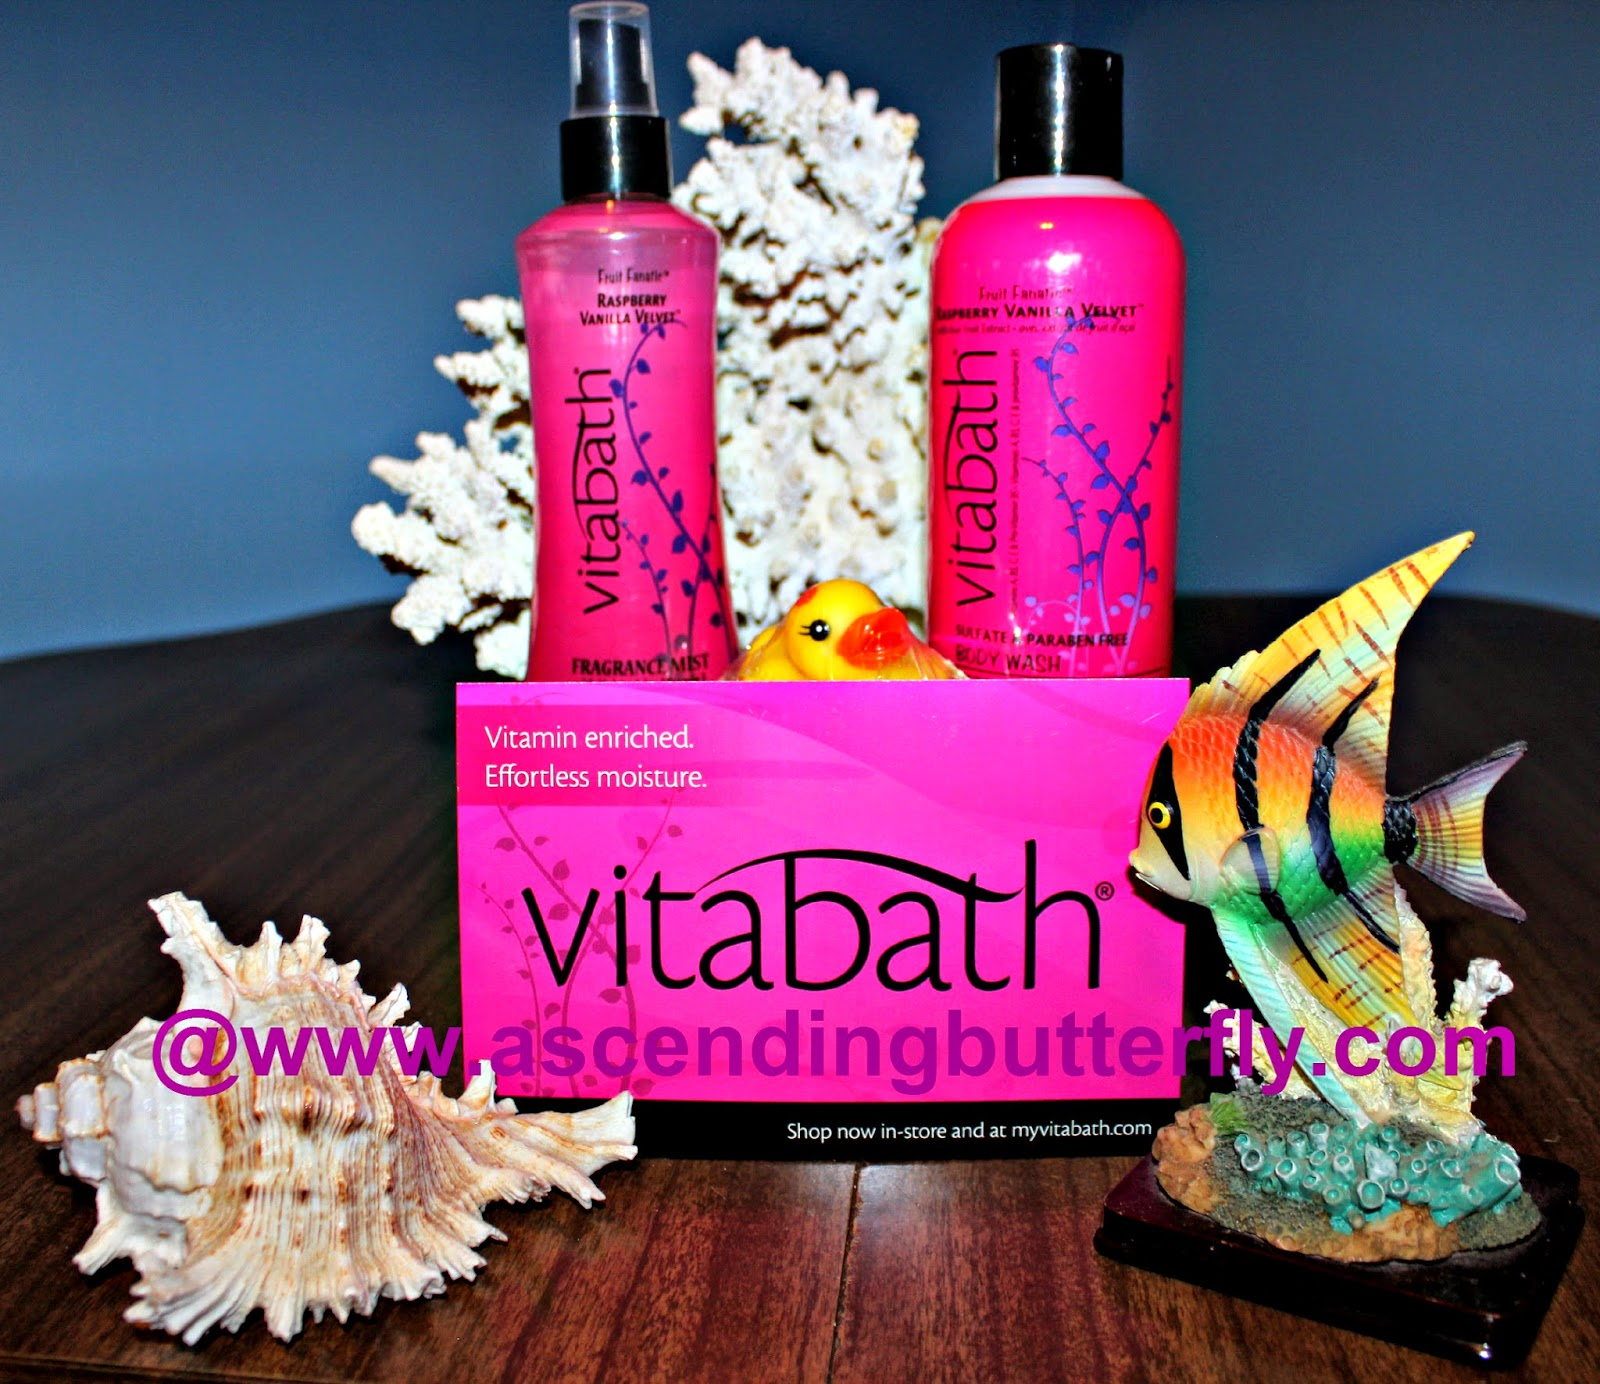 Vitabath #FruityFresh Spring Scents Raspberry Vanilla Velvet Body Wash and Fragrance Mist